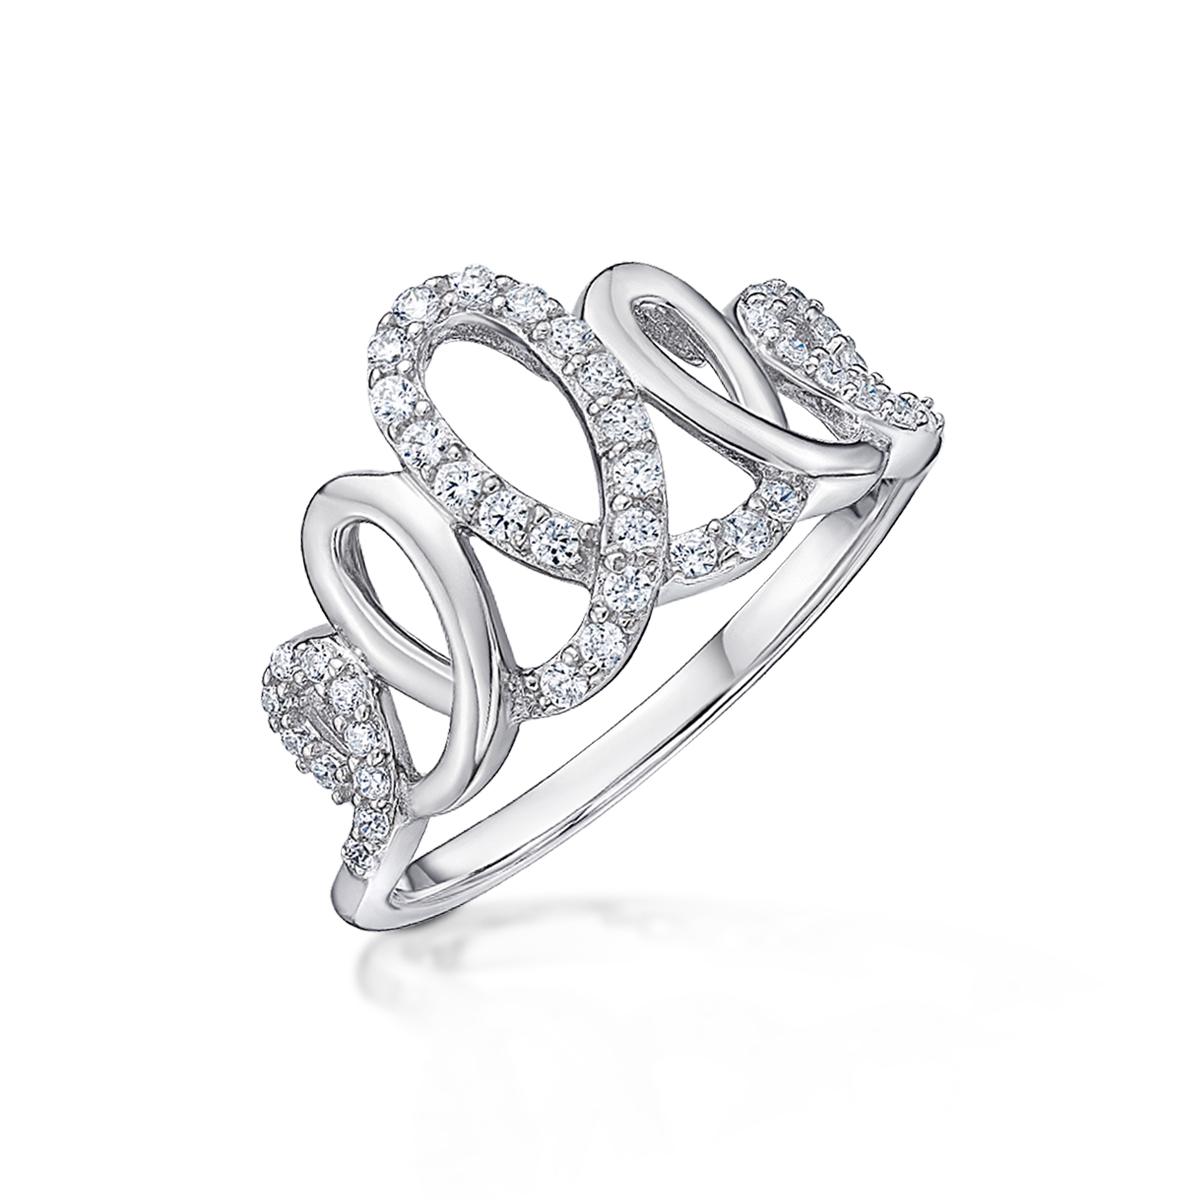 KSW235 璀璨軌跡-皇冠造型奢華戒指